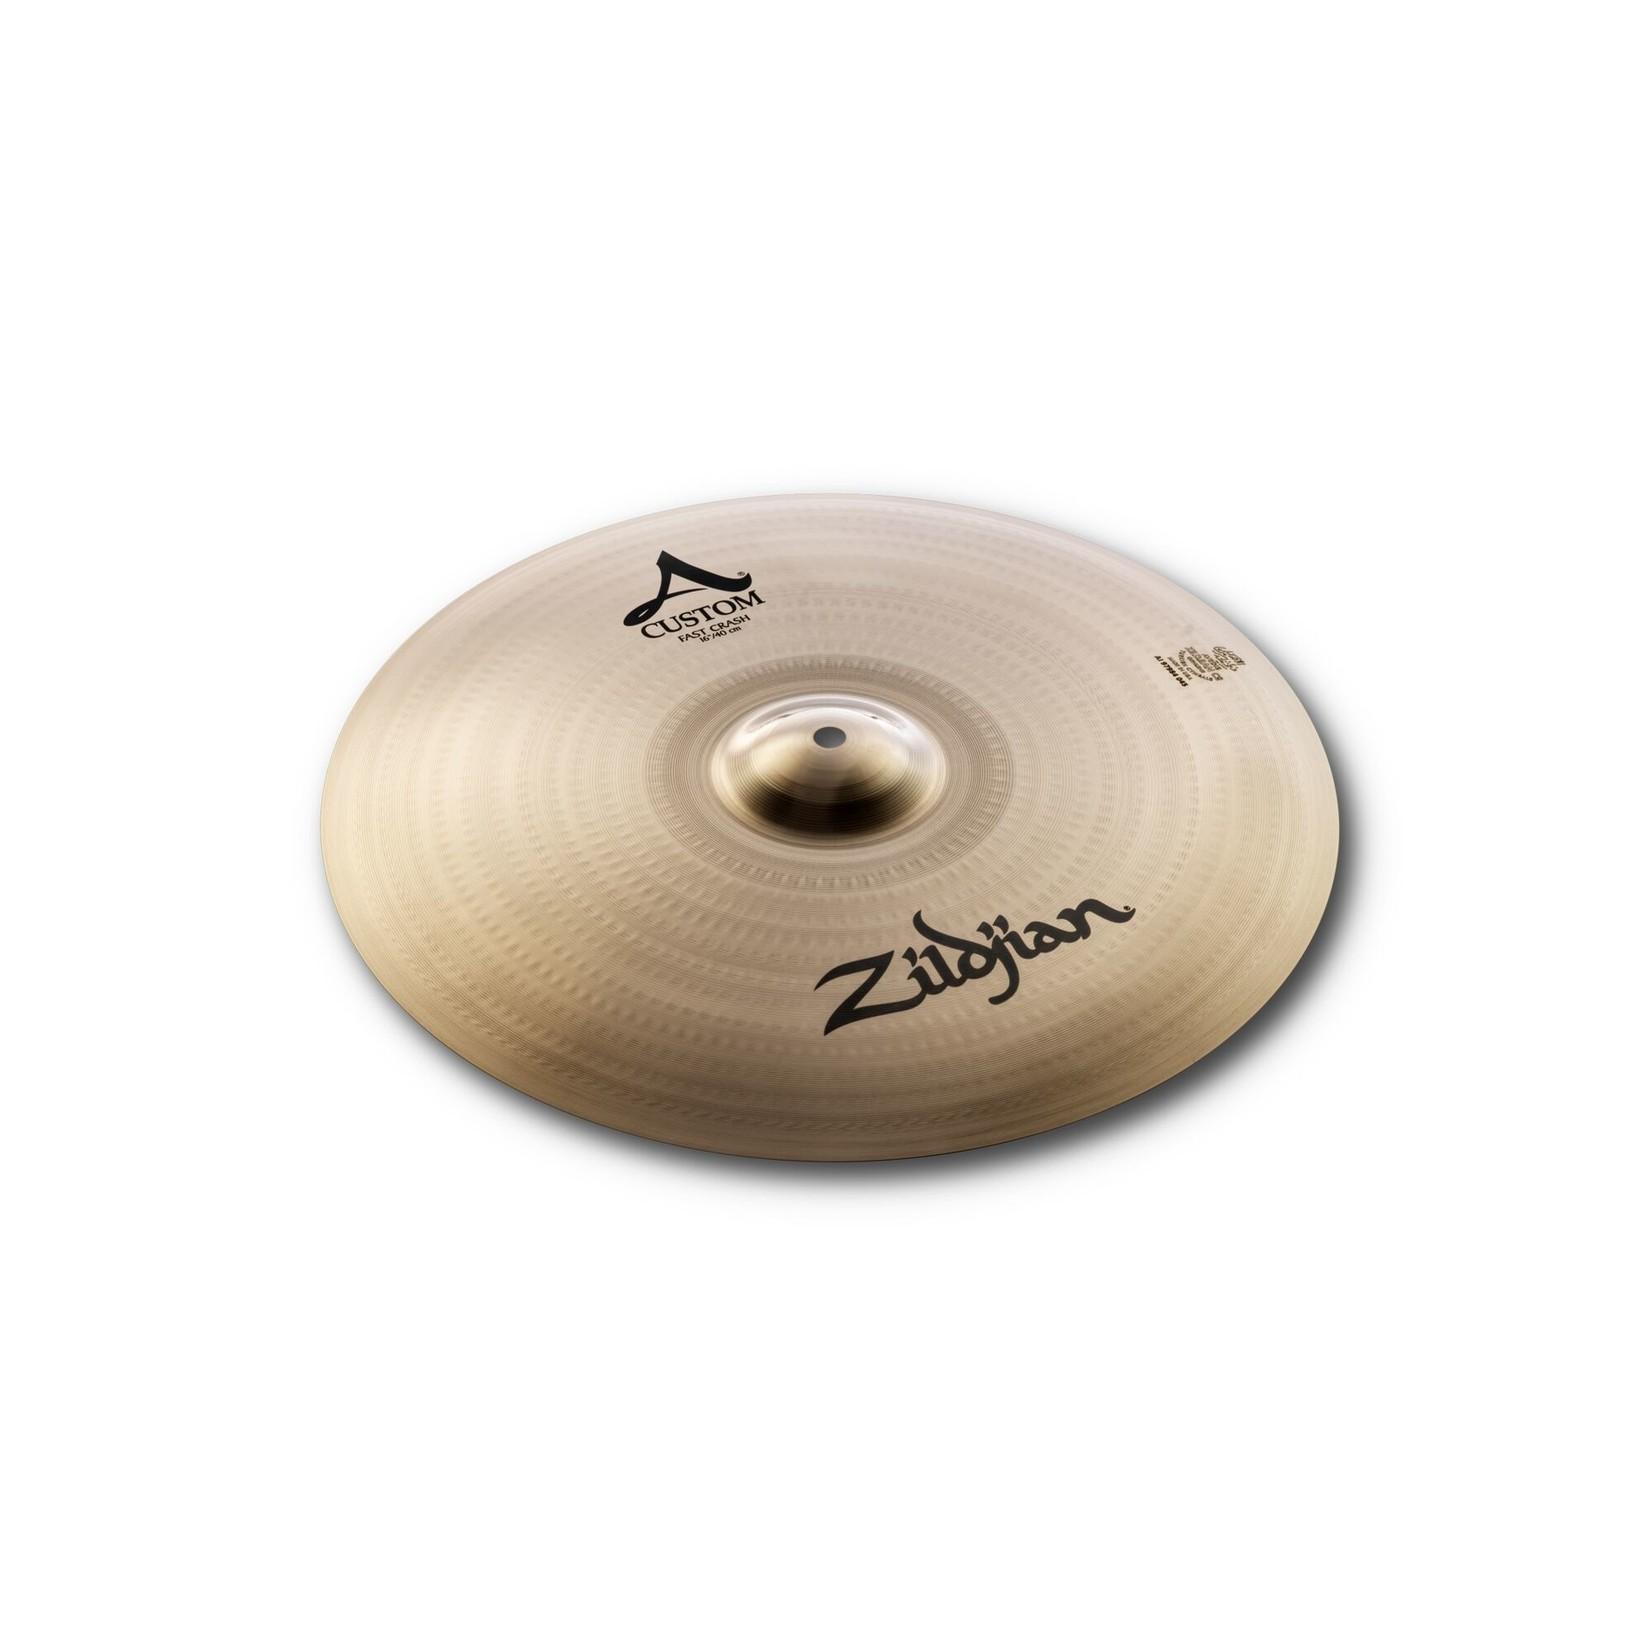 "Zildjian Zildjian 16"" A Custom Fast Crash"